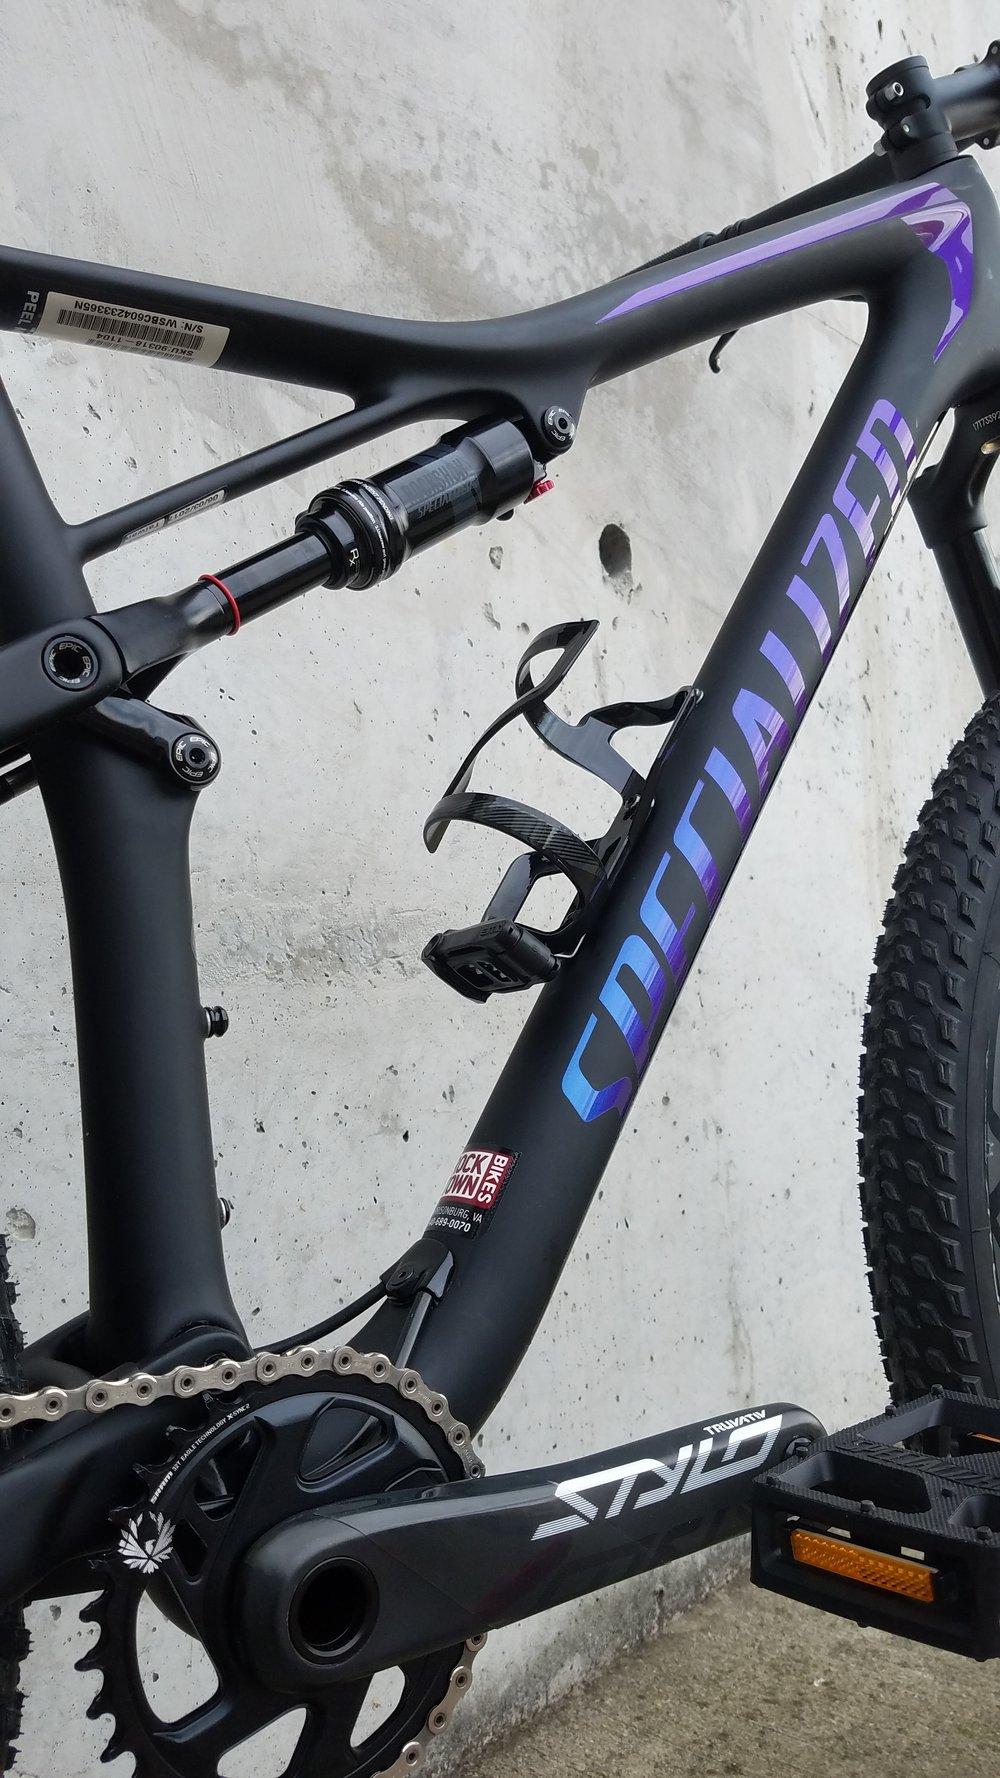 2018 Epic Pro Rocktown Bicycles